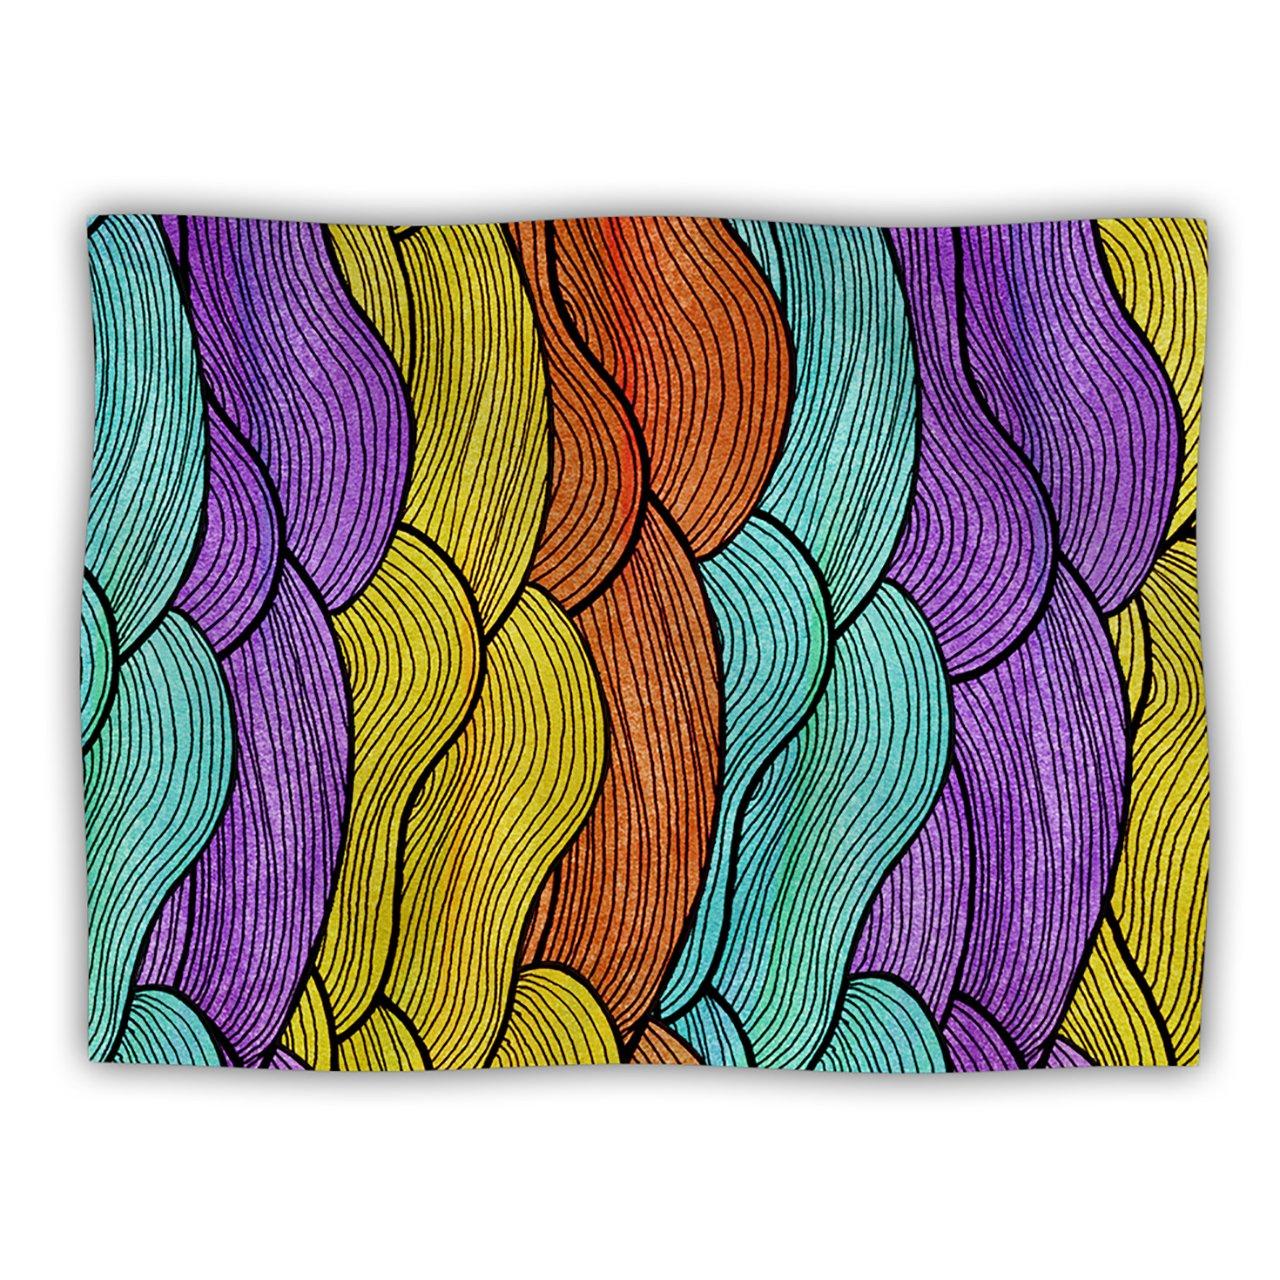 KESS InHouse Pom Graphic Design Textiles Pet Dog Blanket, 60 by 50-Inch